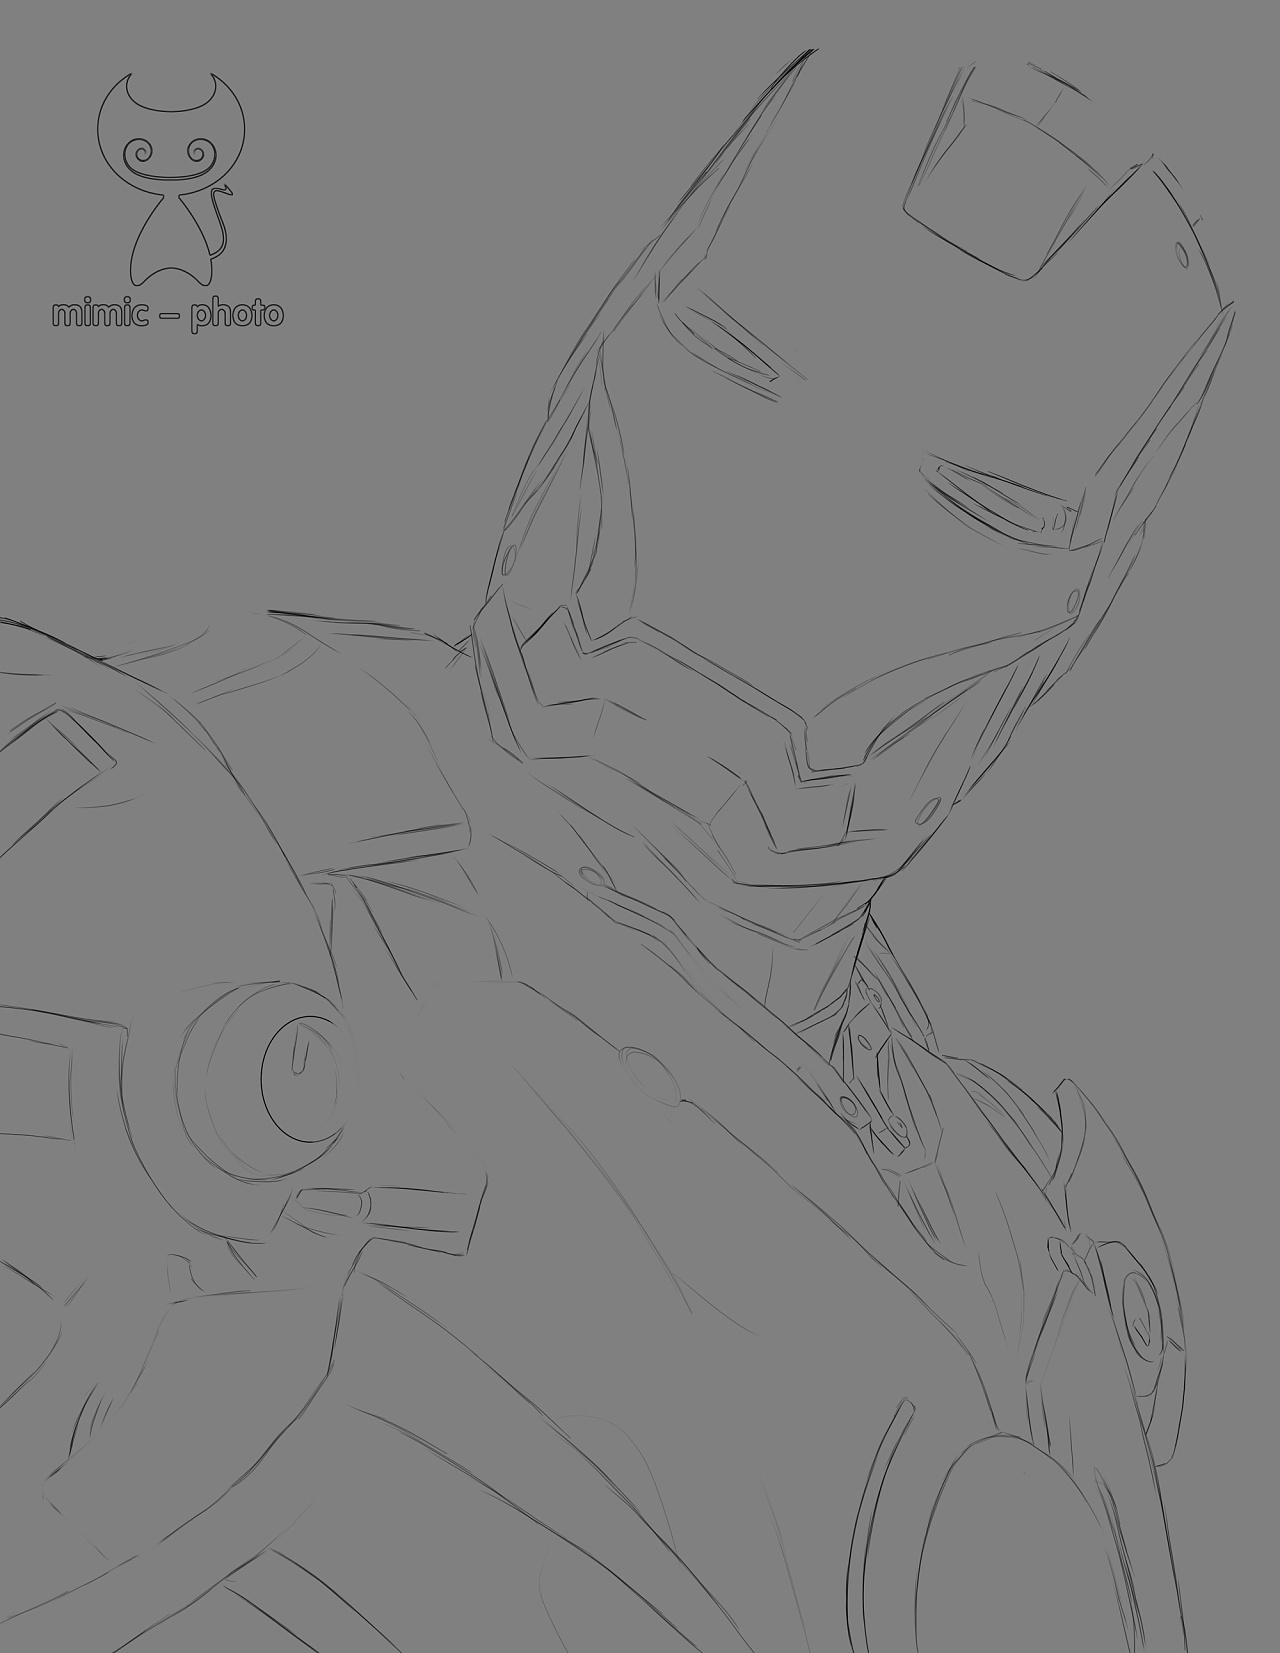 ps 临摹 手绘 《钢铁侠》